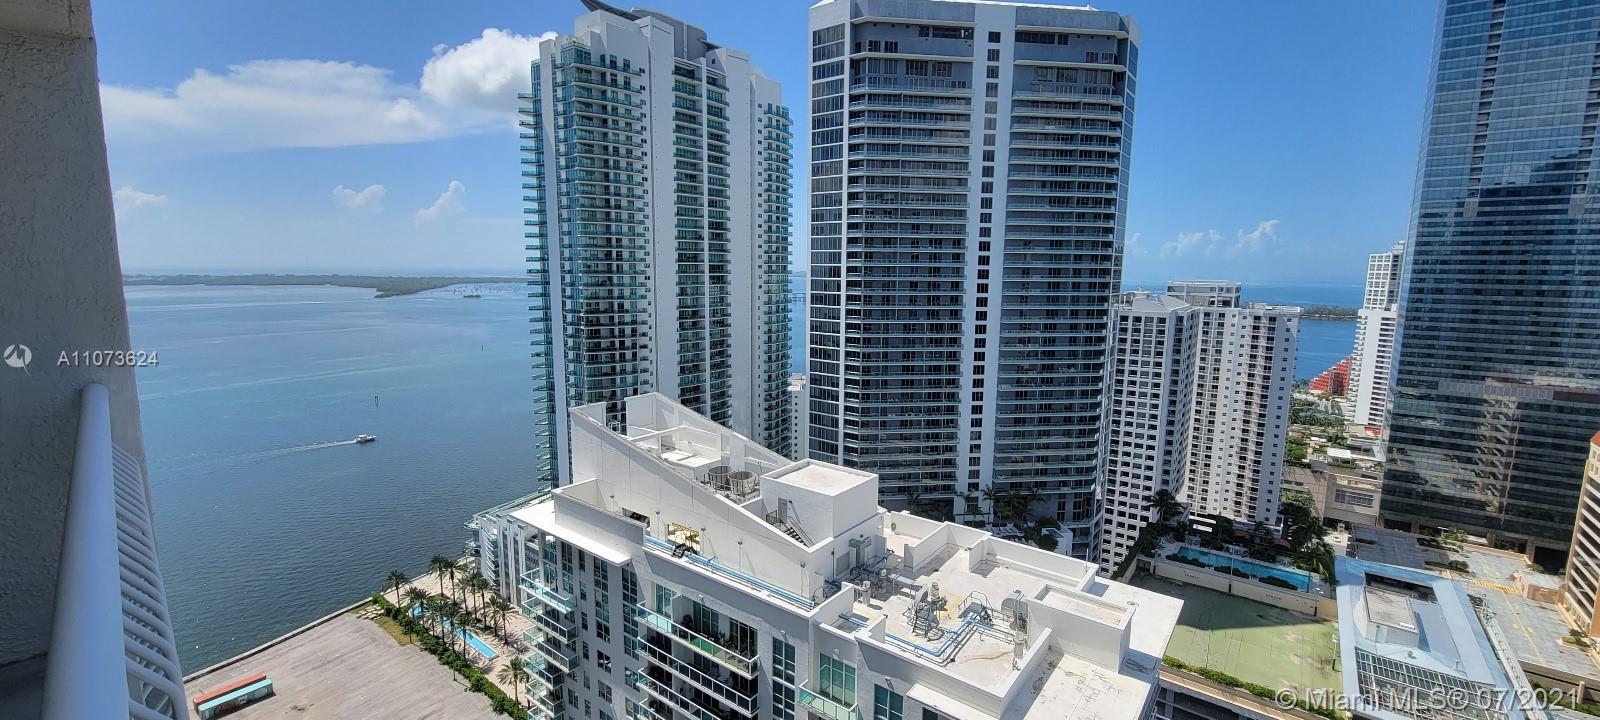 Club at Brickell #3619 - 1200 Brickell Bay Dr #3619, Miami, FL 33131